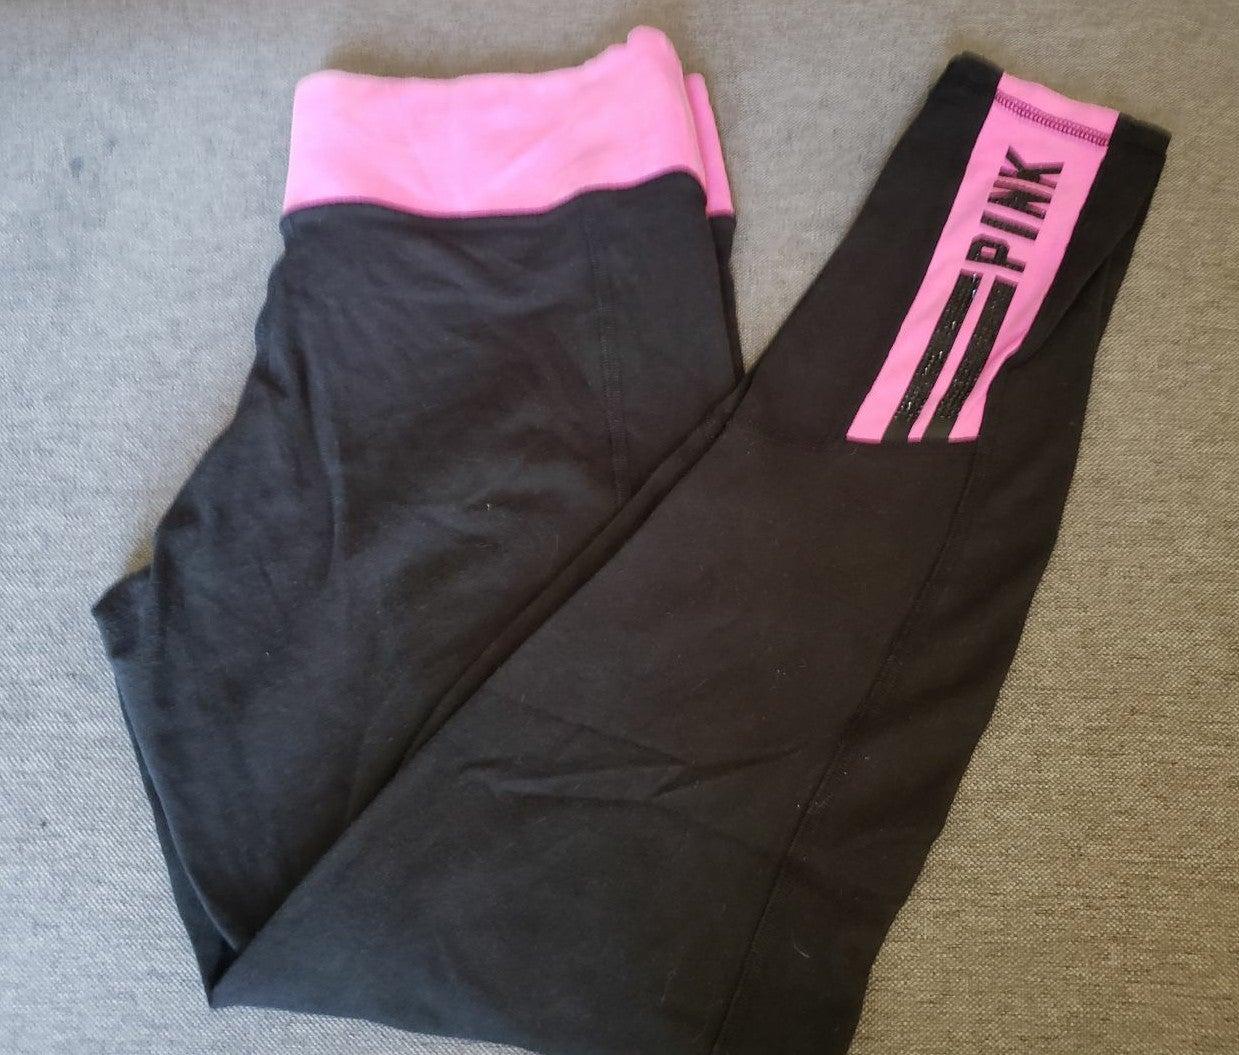 Vs PINK Leggings (Size M)